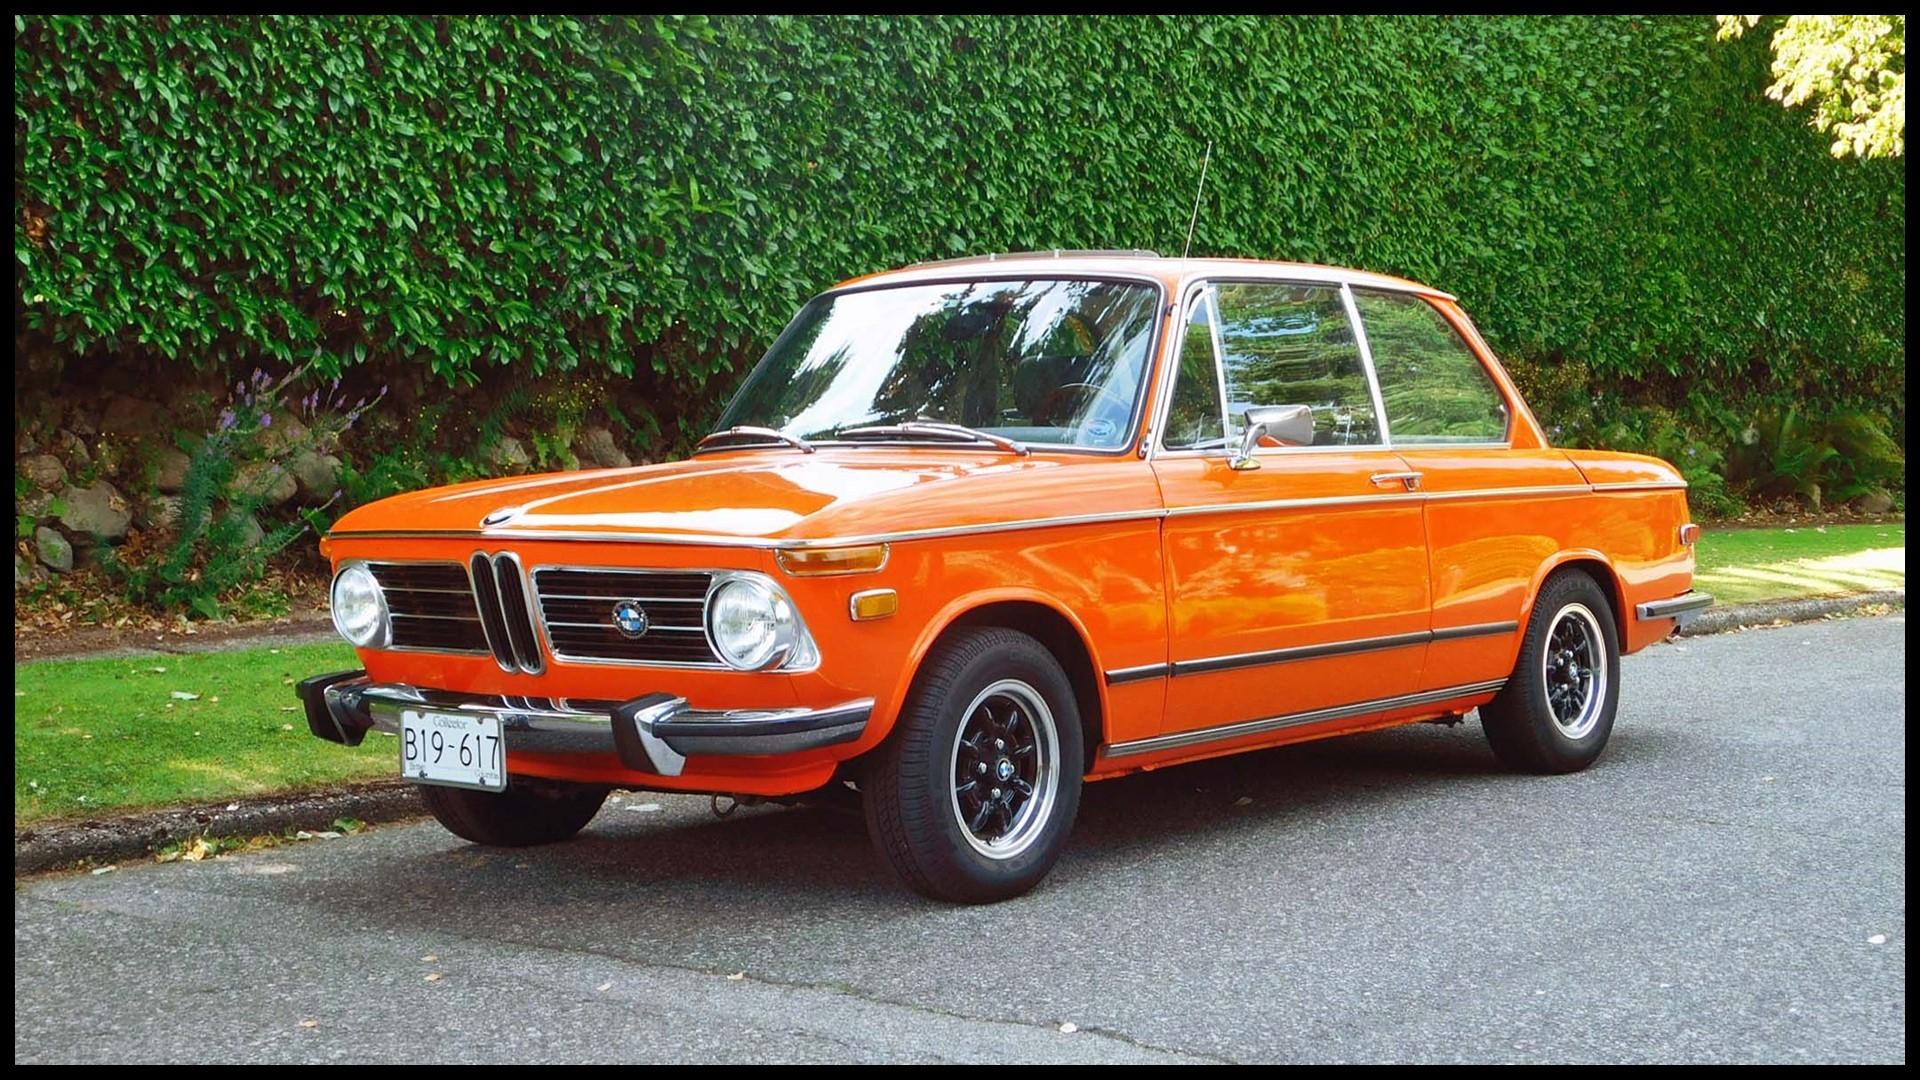 1972 Bmw 2002tii for Sale Classic Drive 1973 Bmw 2002tii